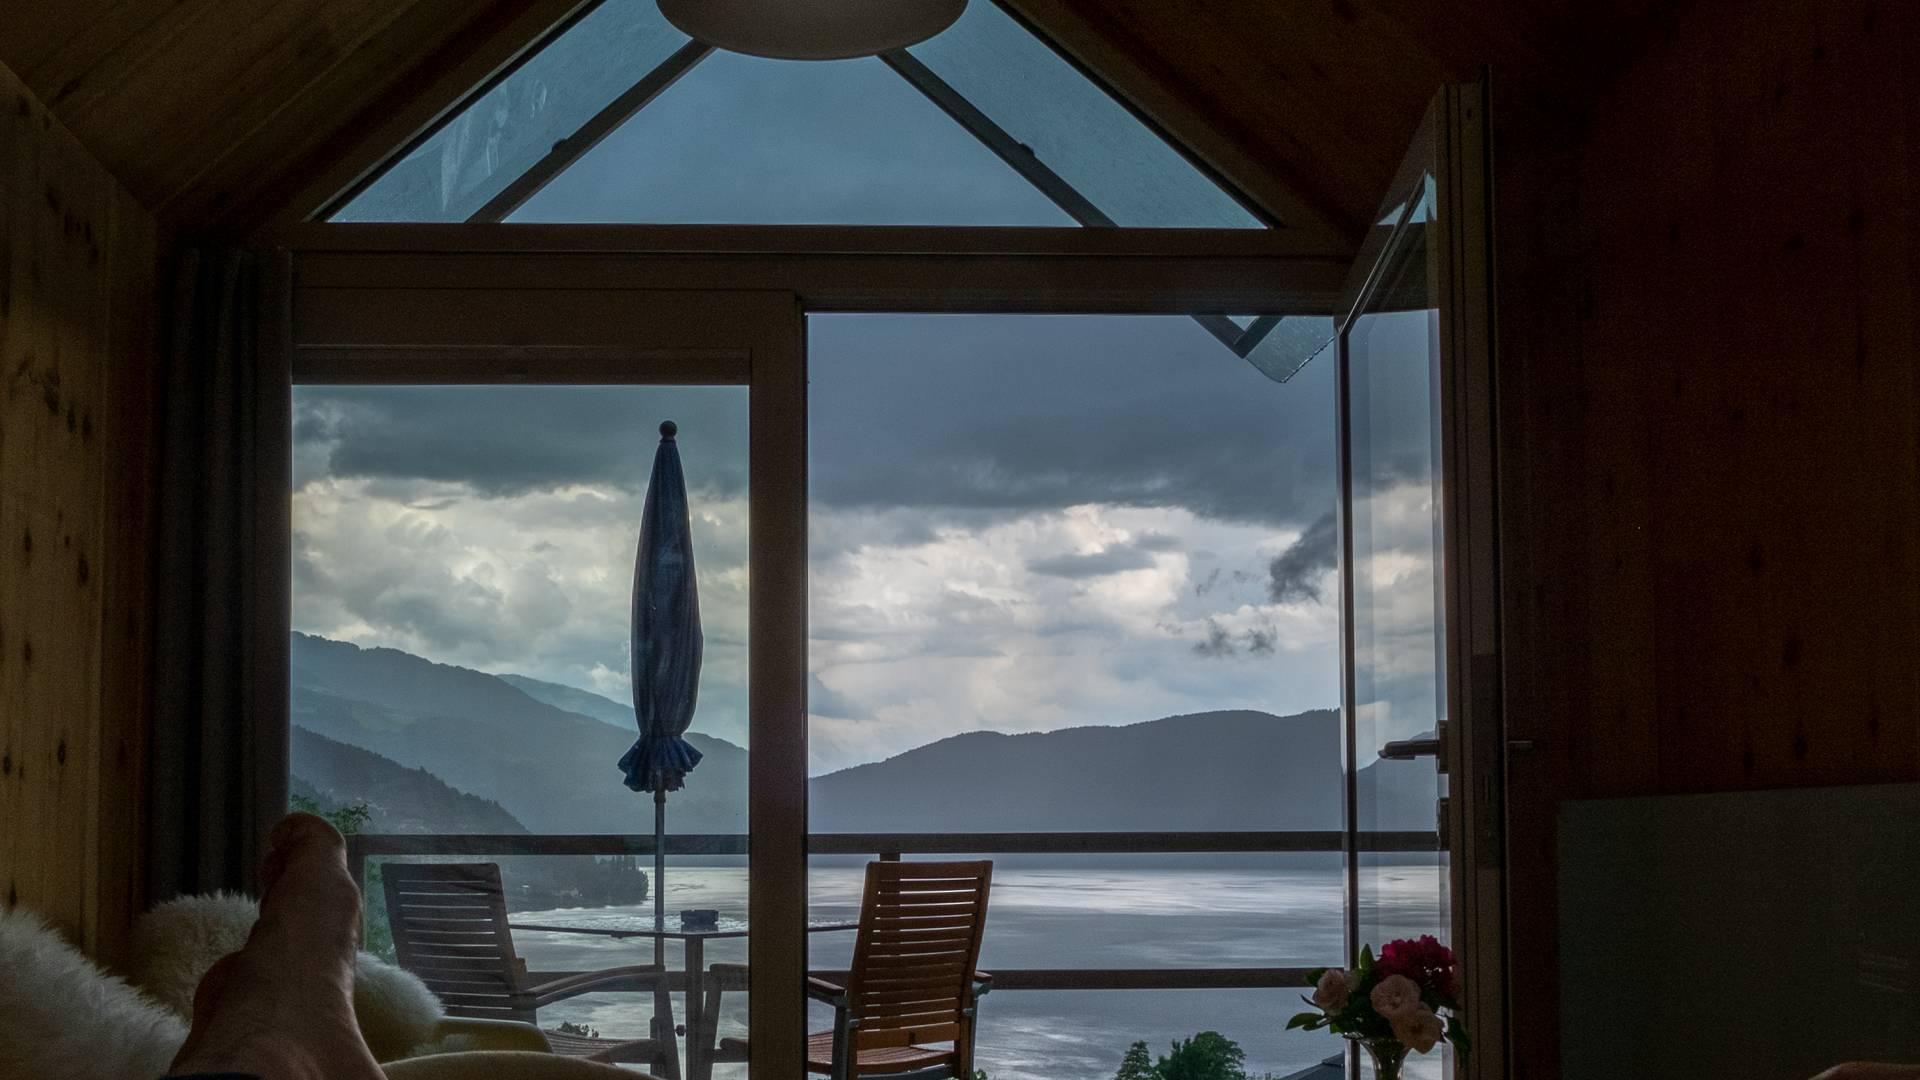 <p>Urlaub zu zweit am Millstätter See, Biwak am Campingplatz; Sabrina Schütt</p>